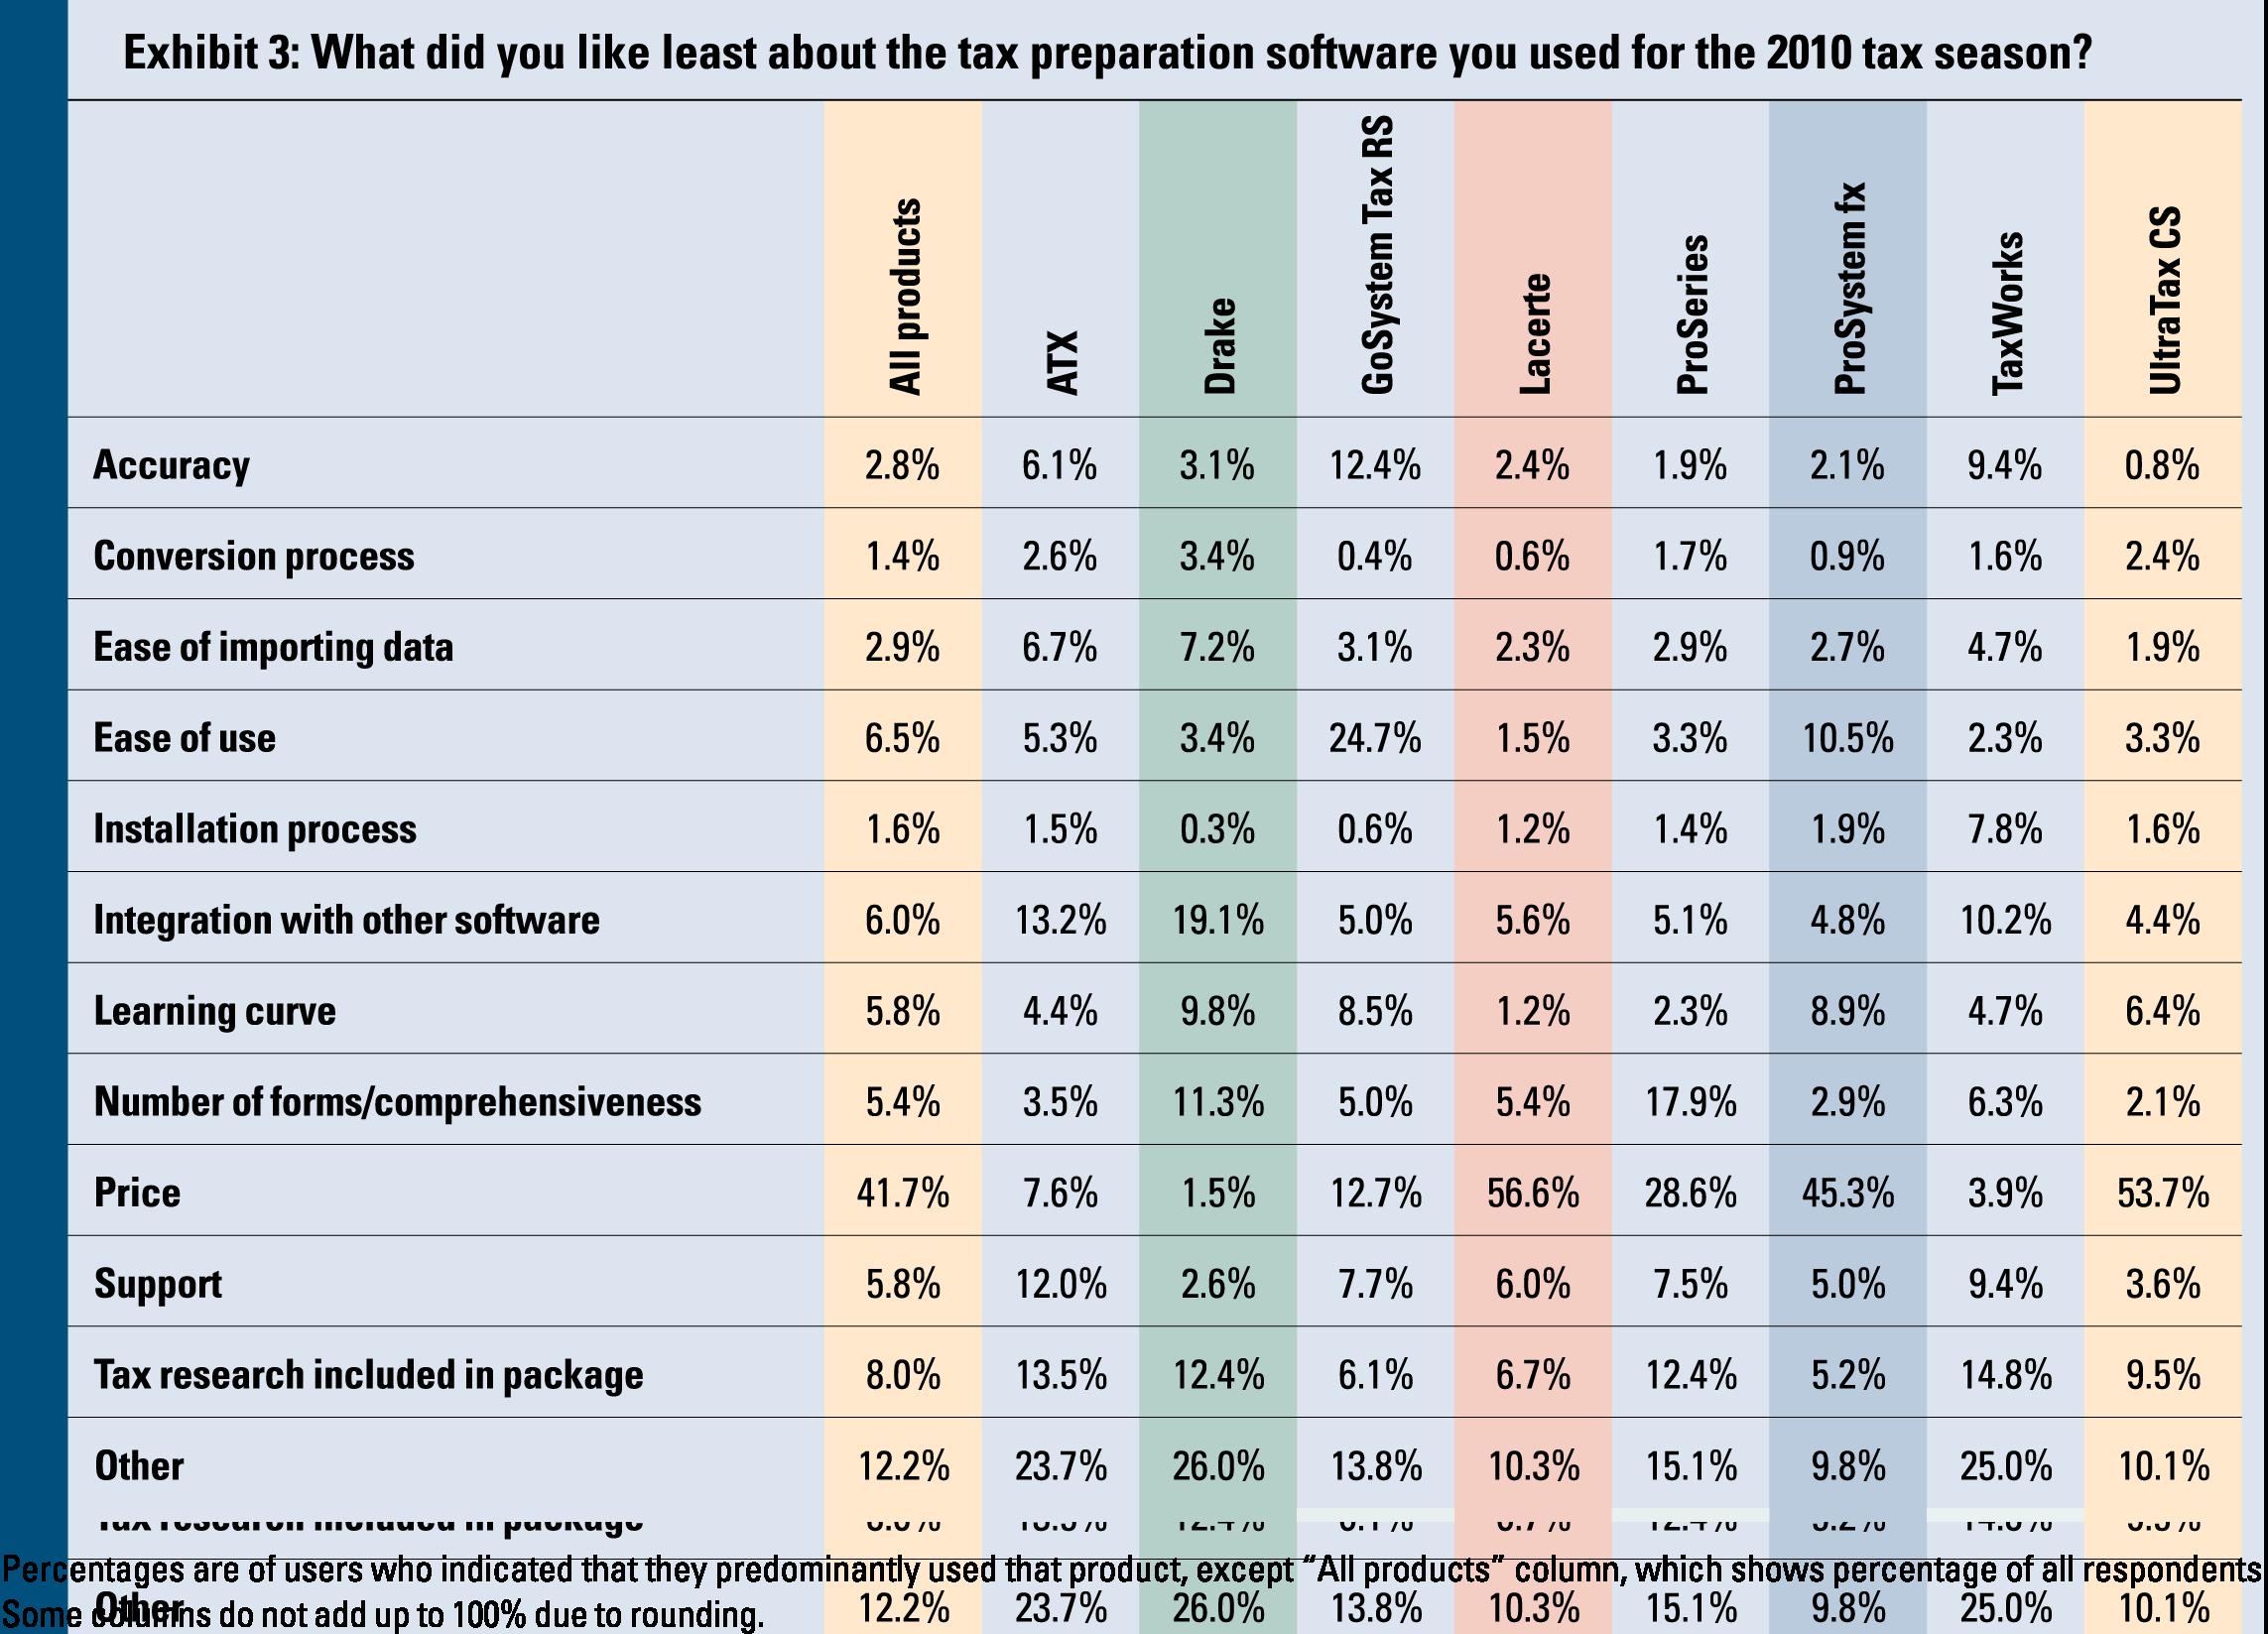 2011 Tax Software Survey